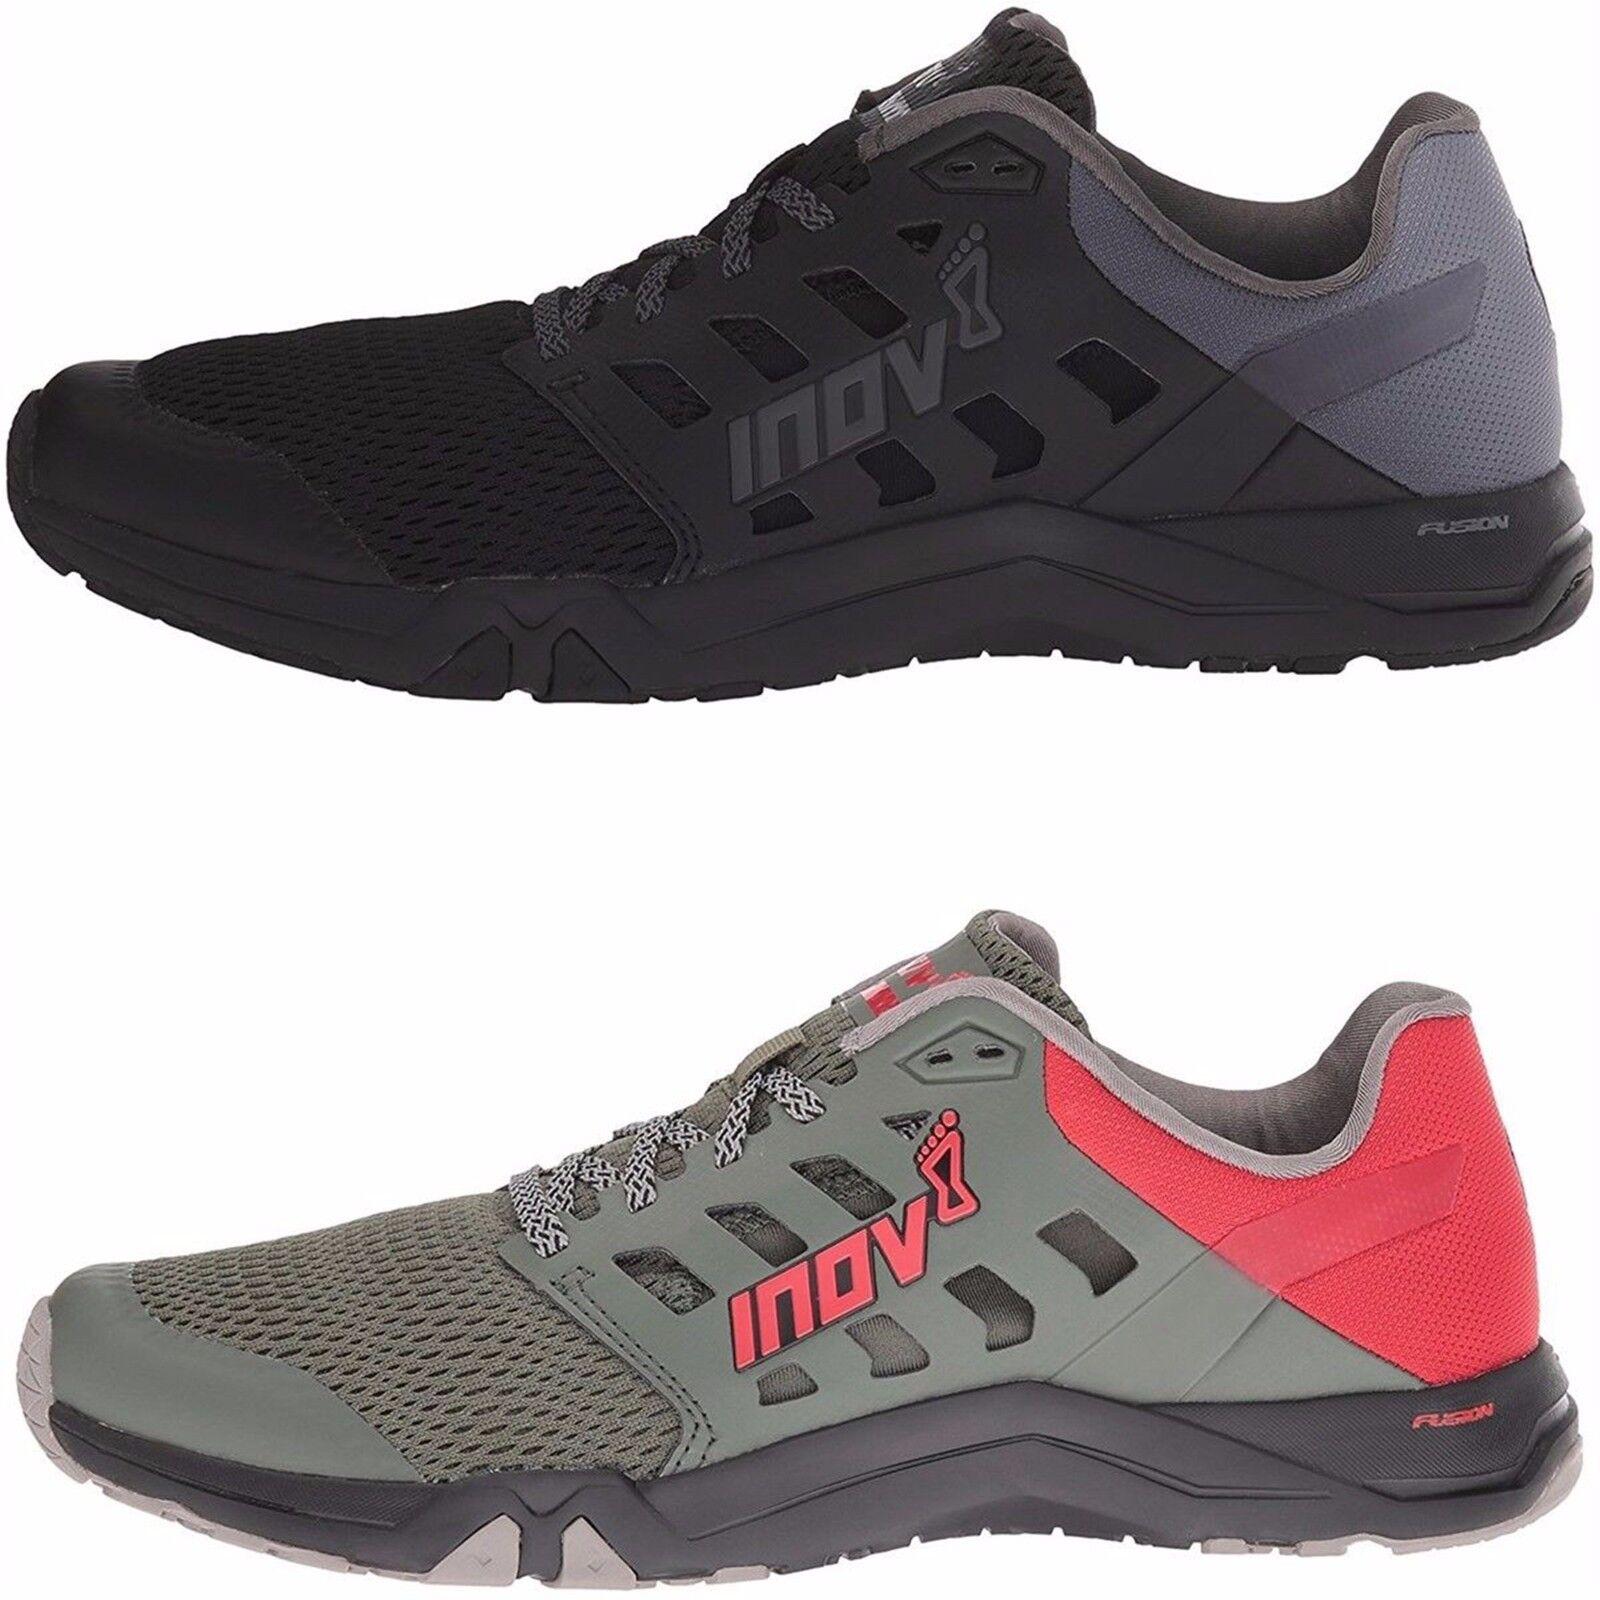 Inov-8 Uomo Uomo Inov-8 Athletic Shoes All Train 215  Running Cross Training  New 900bfa